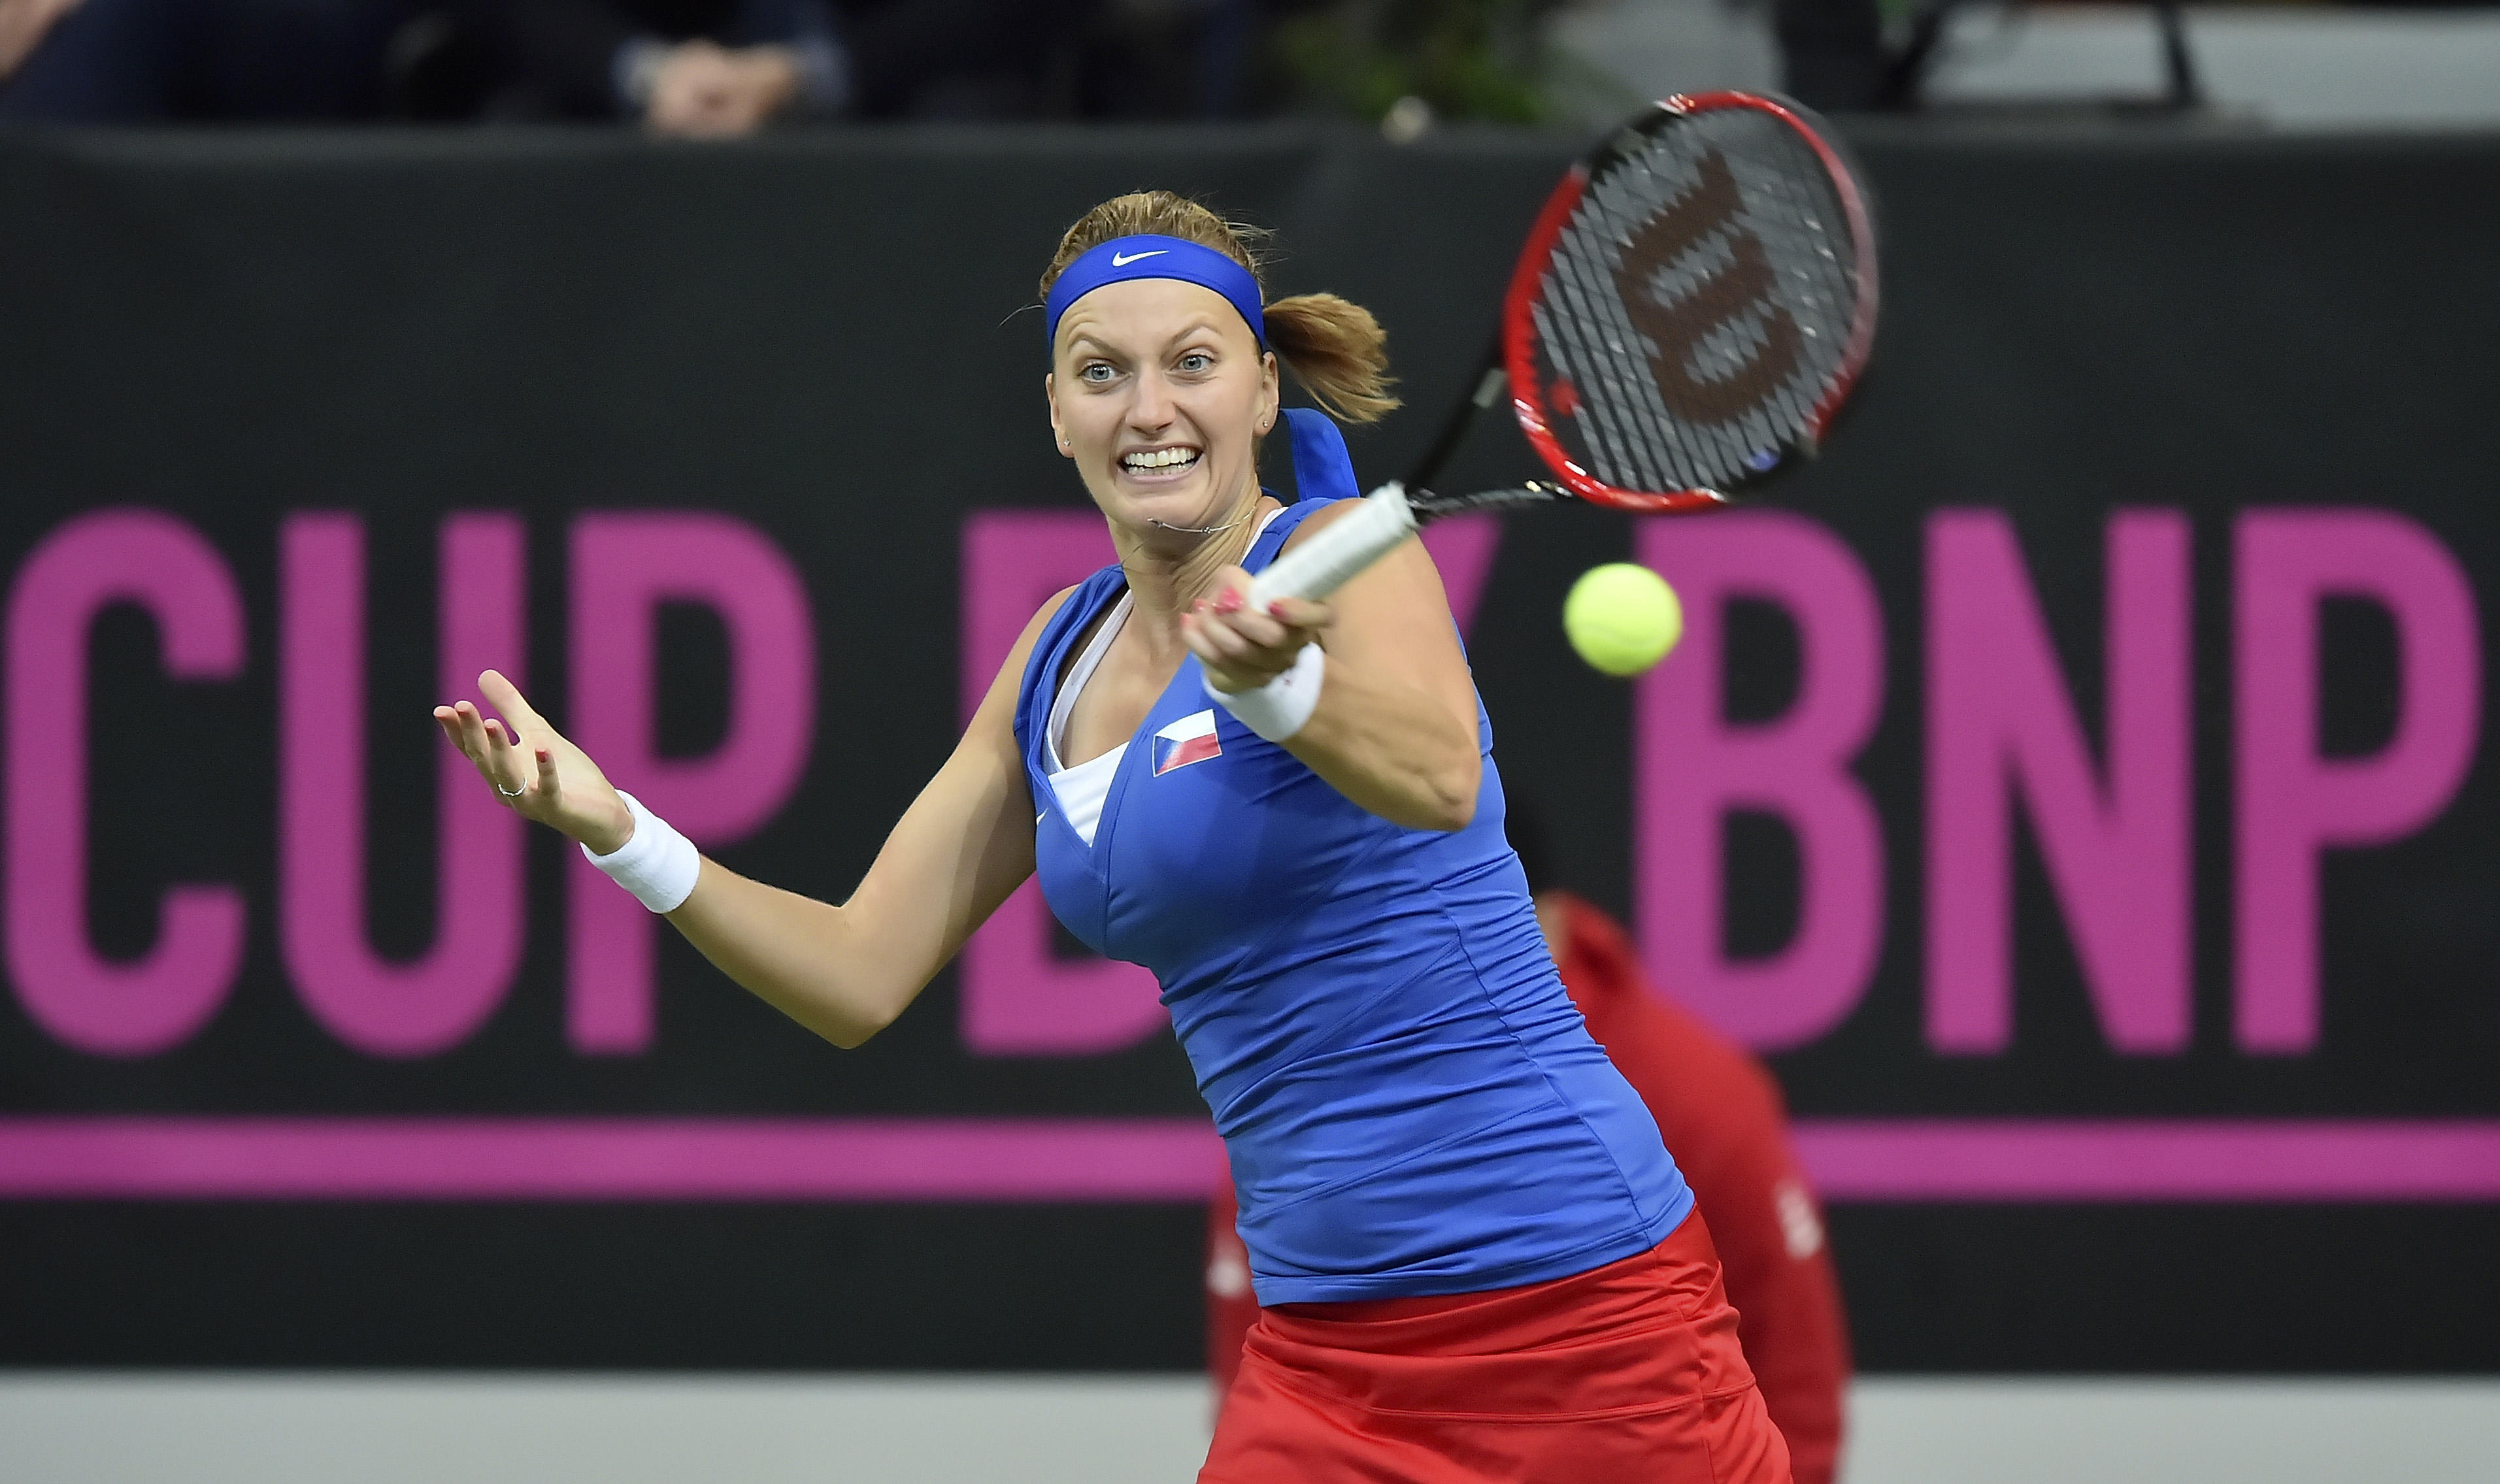 Watch Petra Kvitova's comeback against Anastasia Pavlyuchenkova